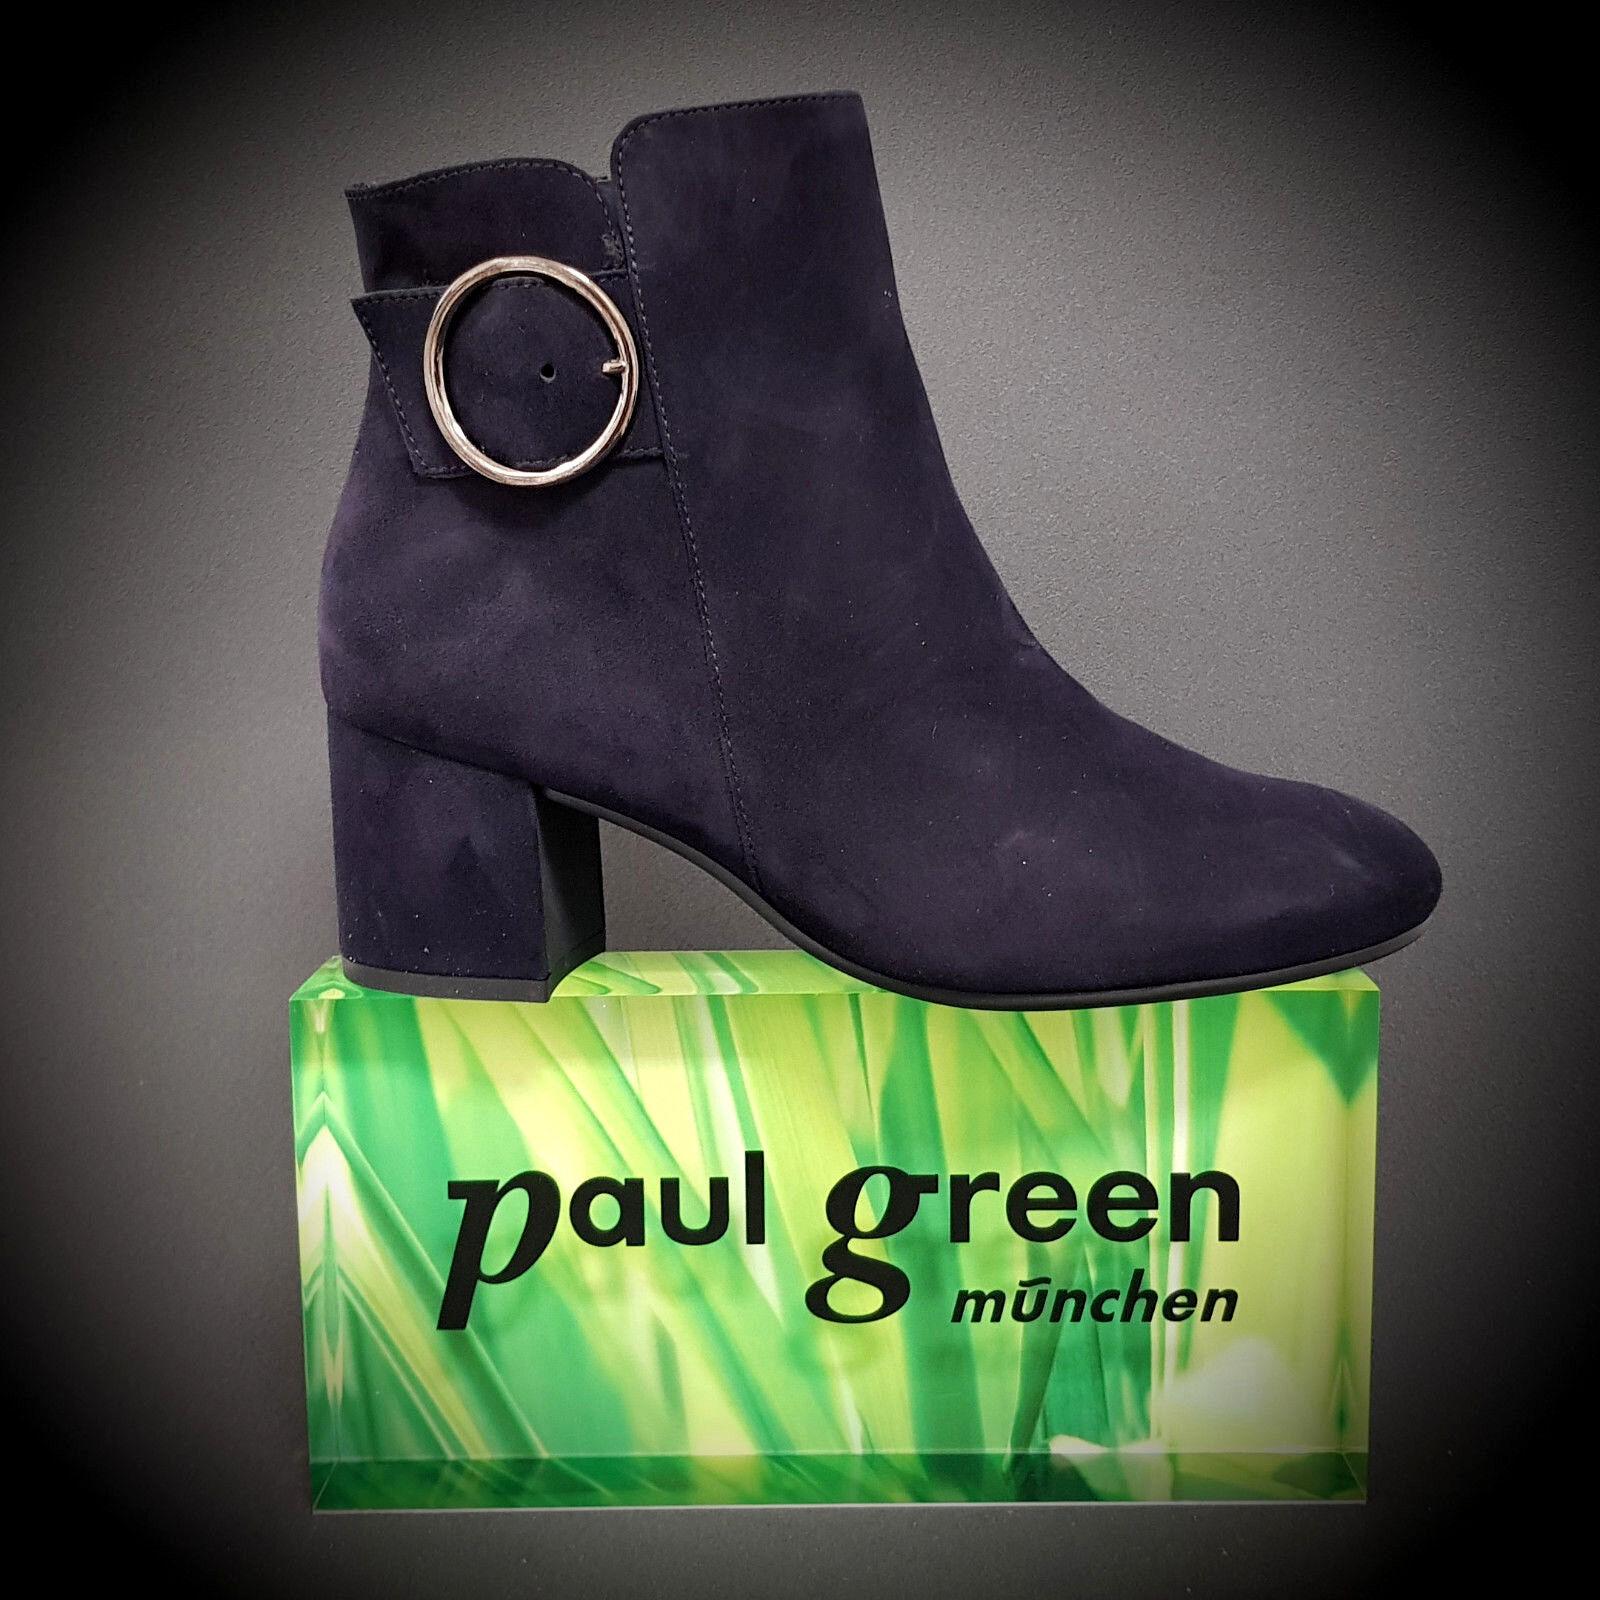 Nuevo Paul Verde botín bota botas ancle de 9322-013 azul de ancle cuero a la moda b514ed